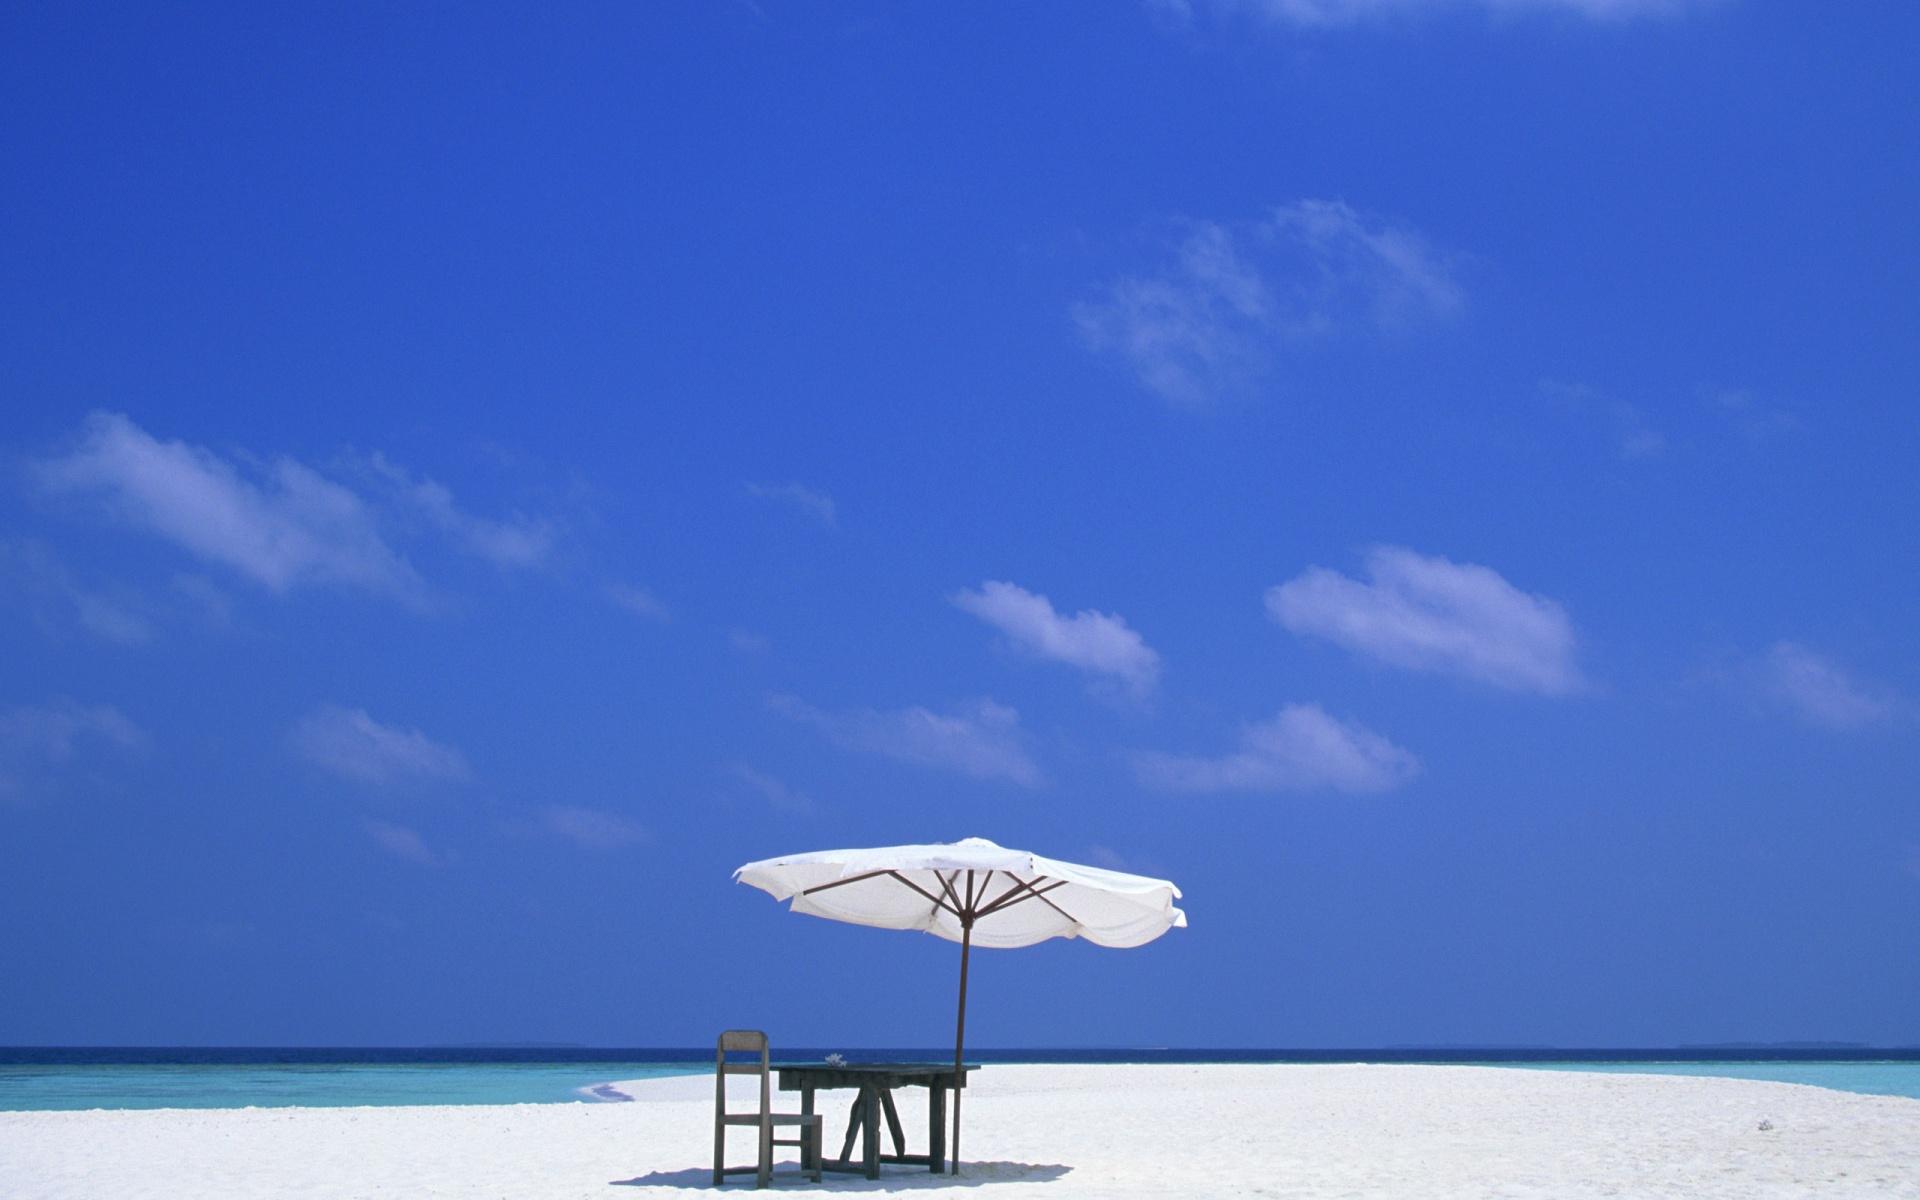 Beach Scene Wallpaper - 4986